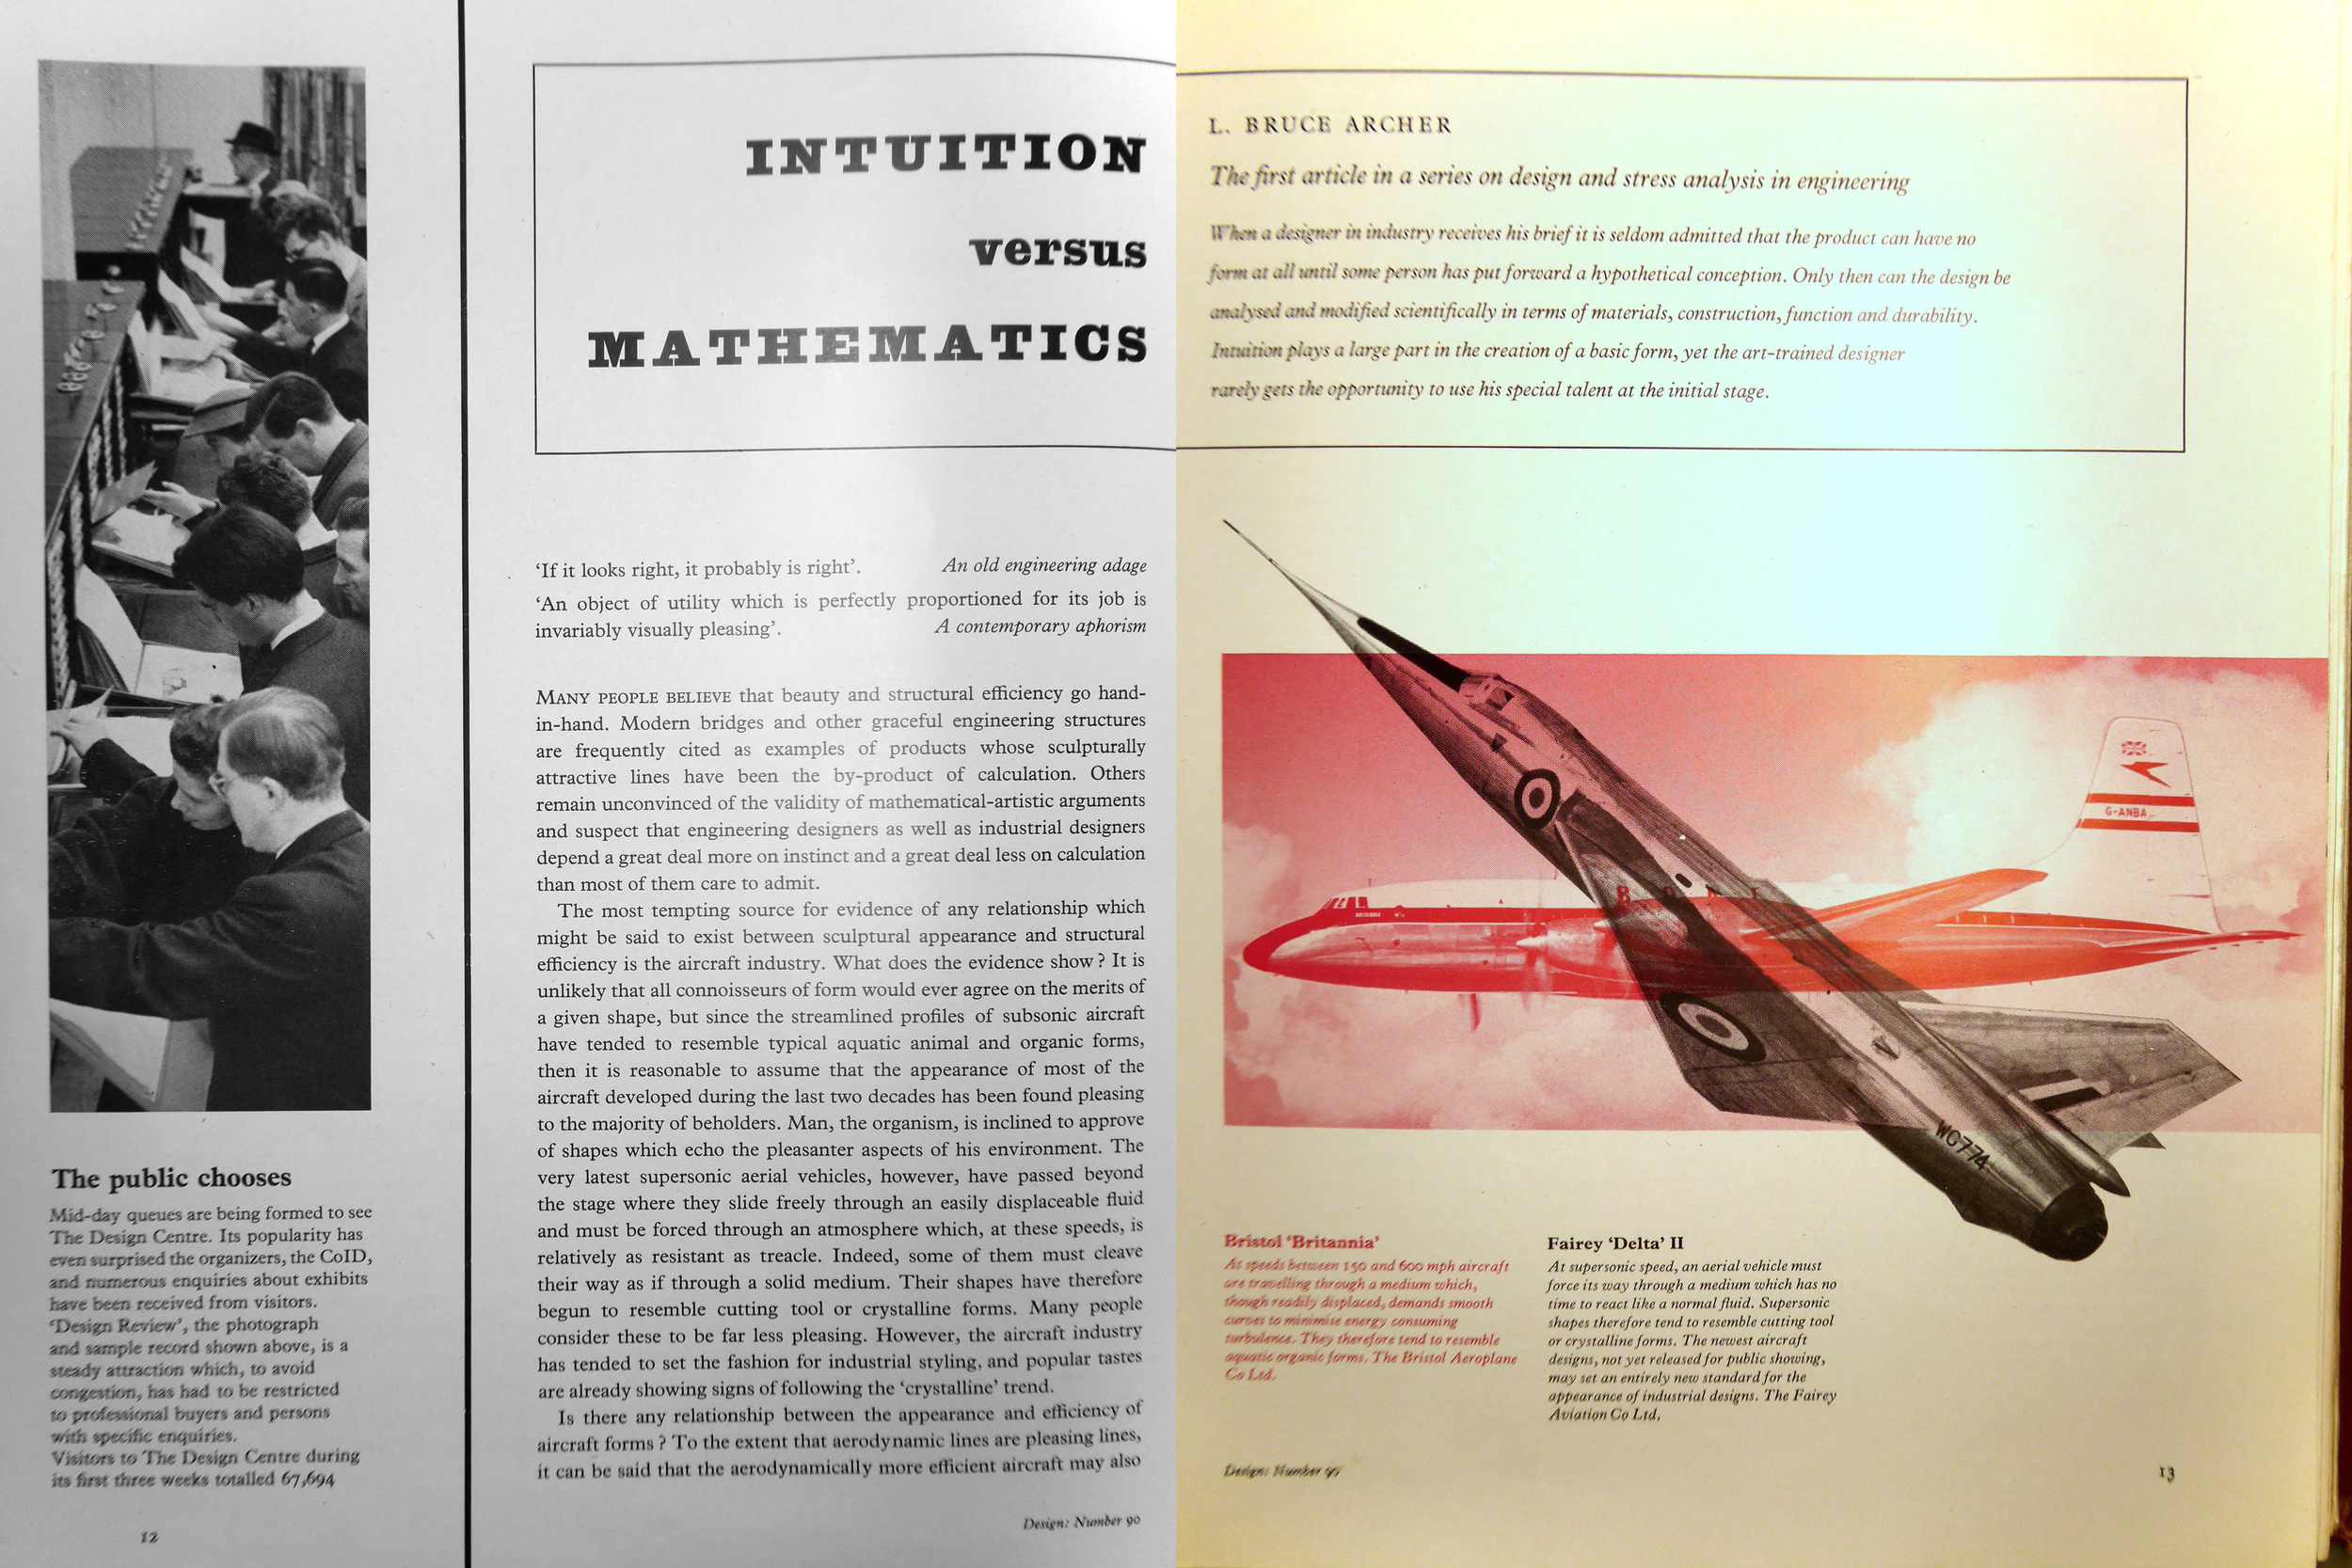 DDR_Intuition-versus-Mathematics_June_1956.jpg